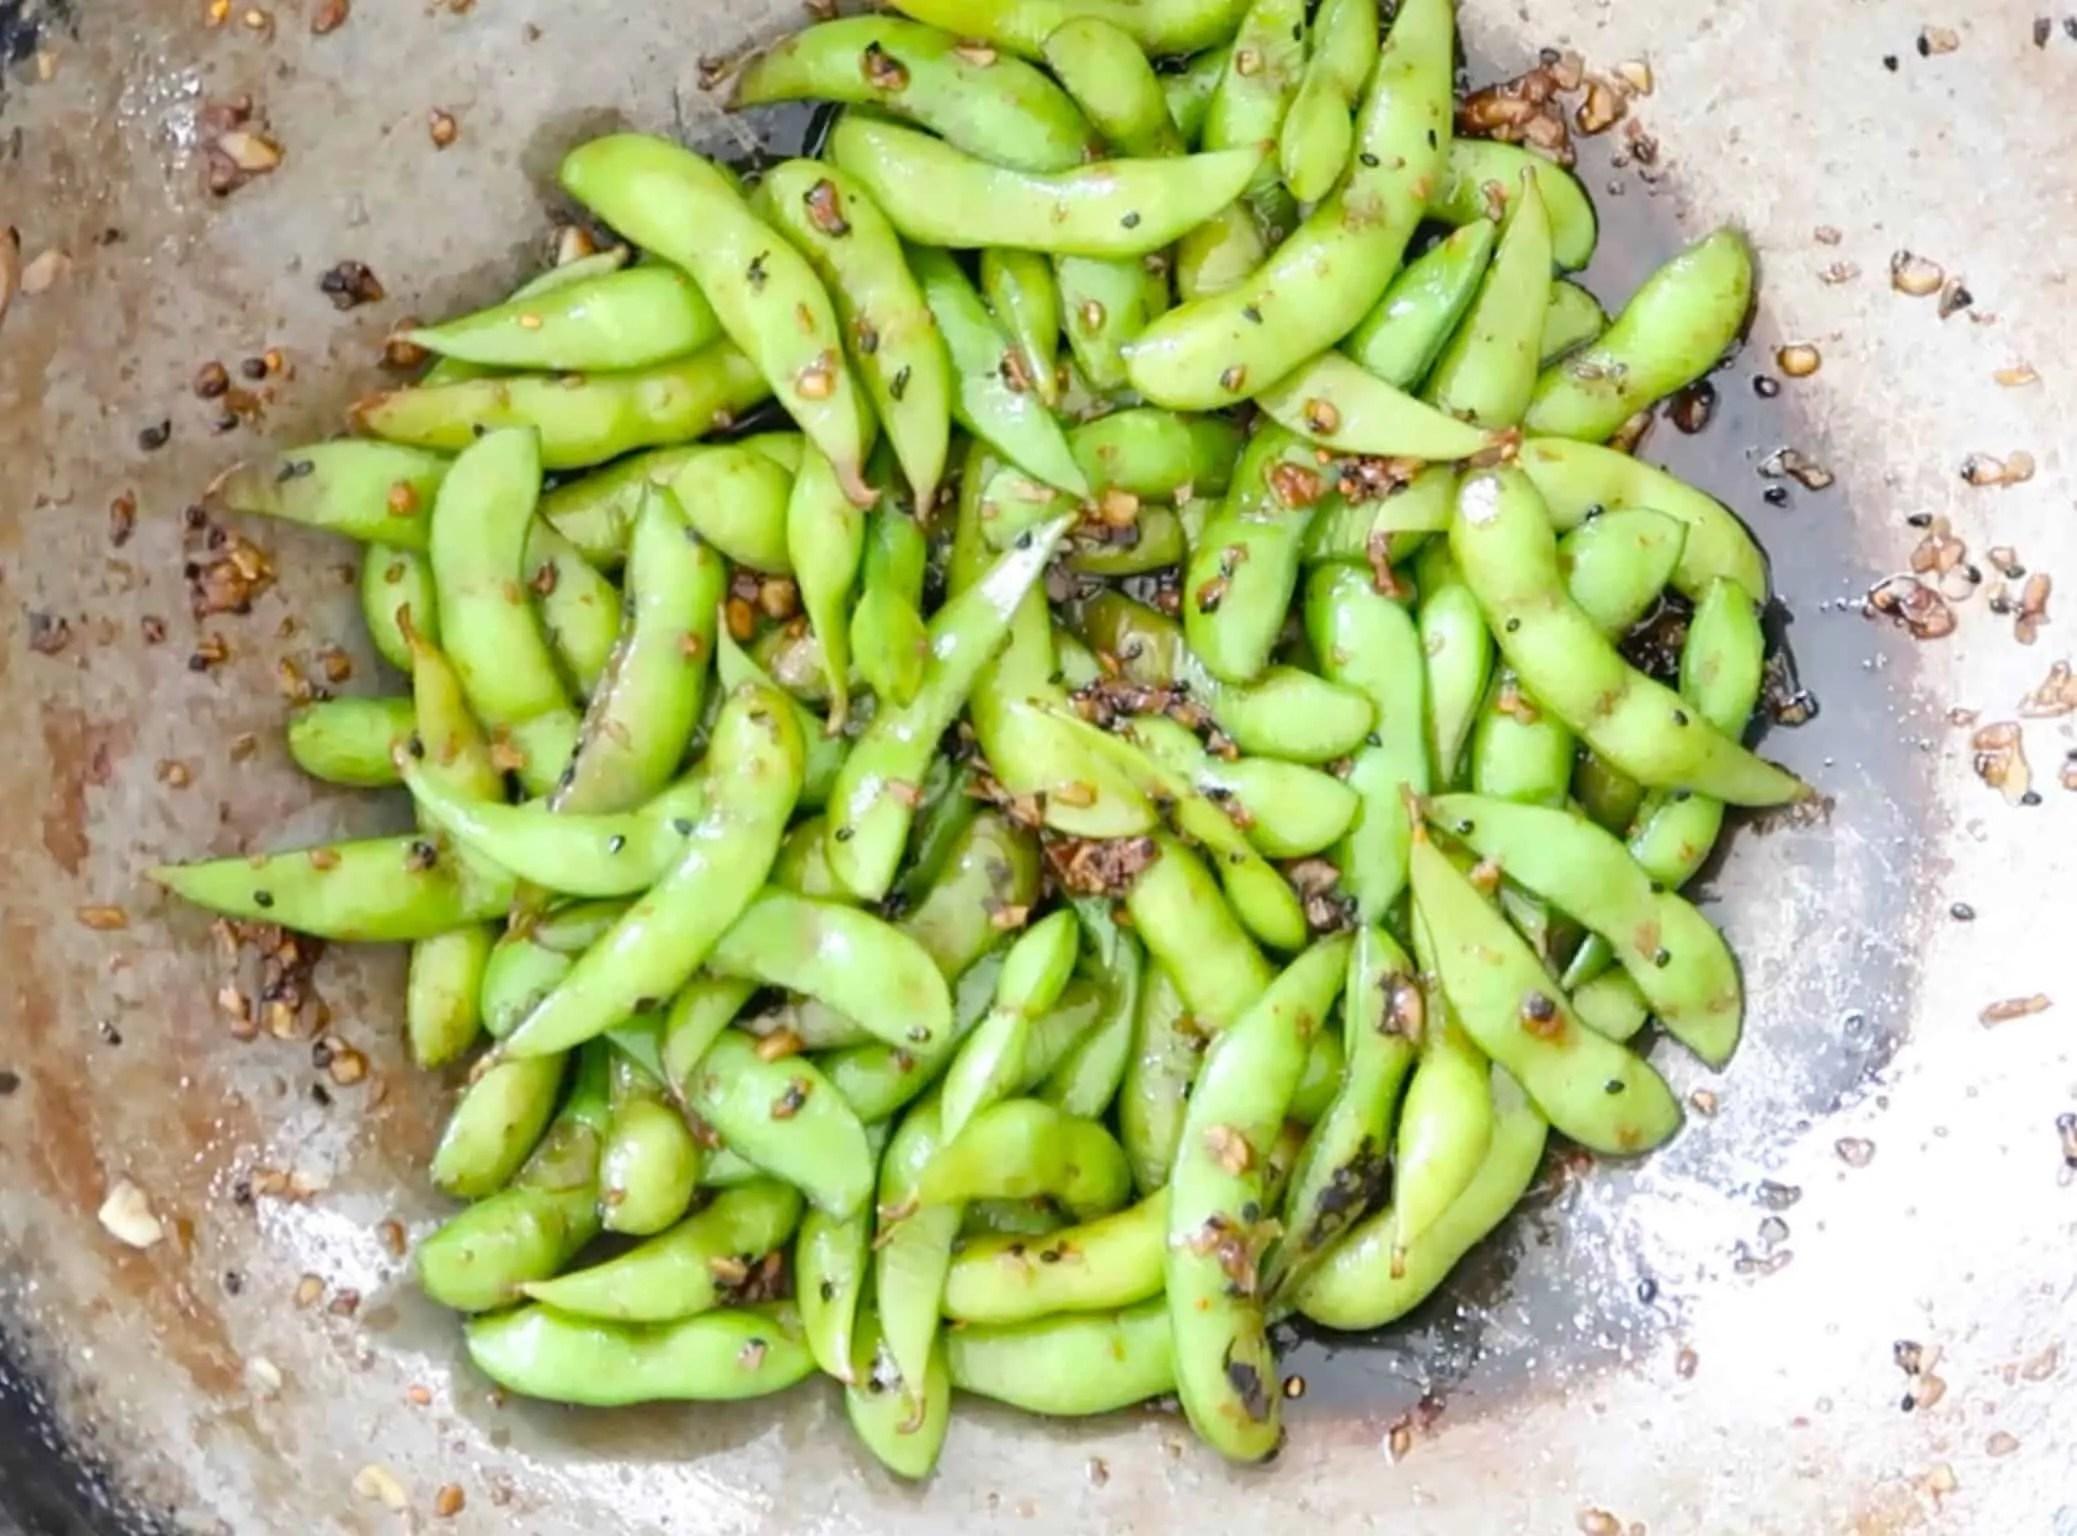 garlic chilli edamame in a wok ready to serve